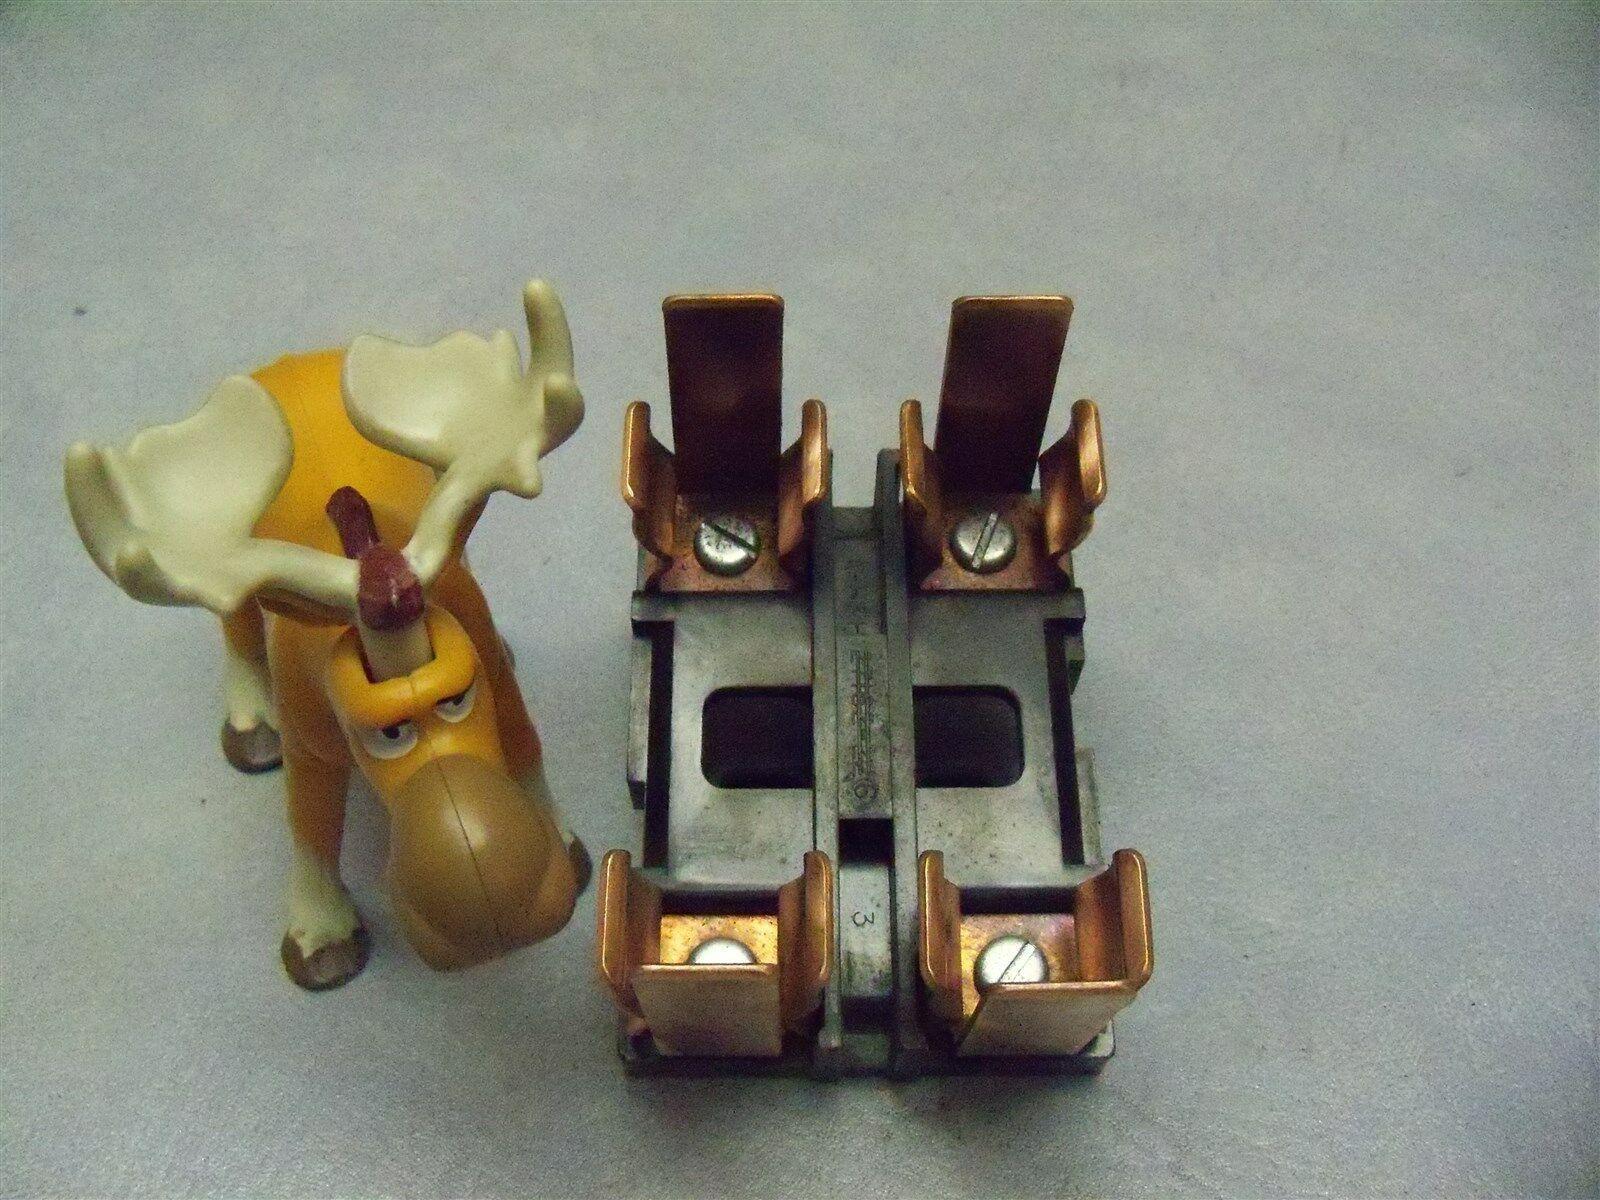 Arrow Hart 27162-22 Fuse Pullout Lid 60 Amp